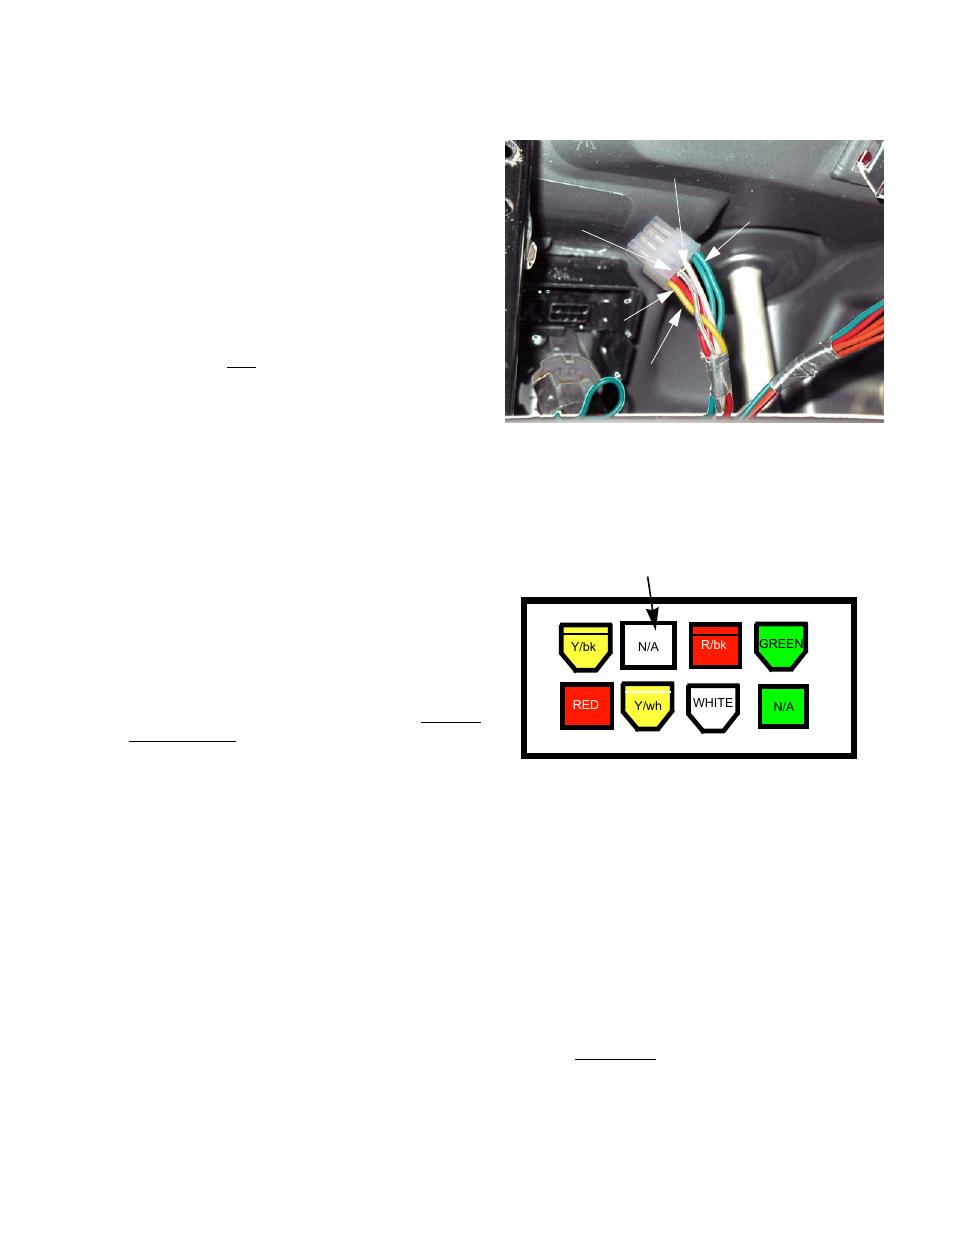 Rmc Module Plug Test Manual Pto Cub Cadet Sltx1000 Series User 129 Wiring Diagram Page 153 278